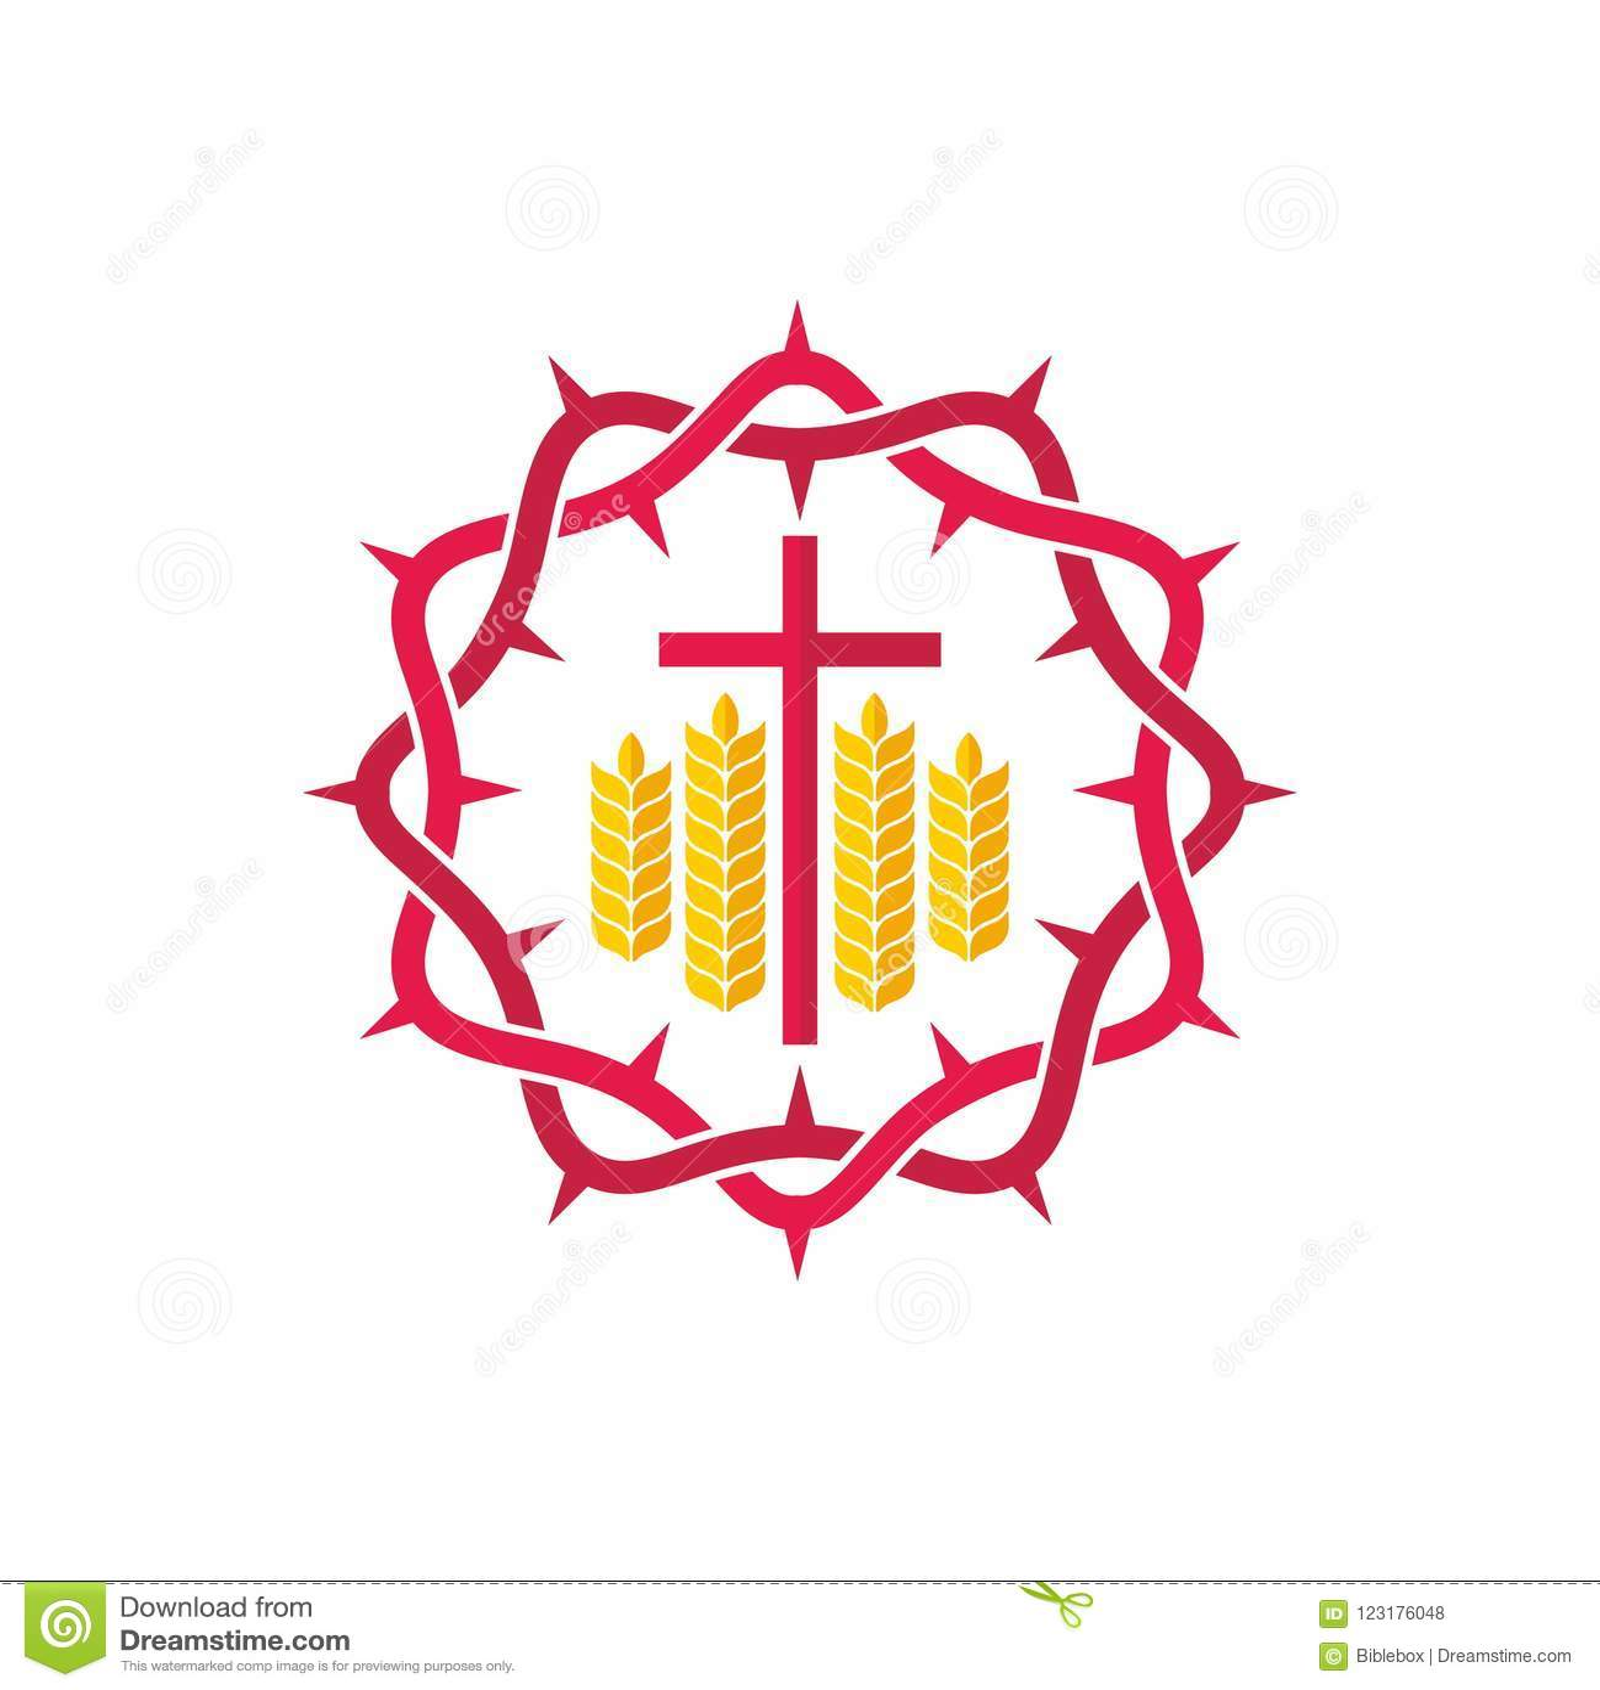 Church Logo Christian Symbols Crown Of Thorns Cross And Wheats